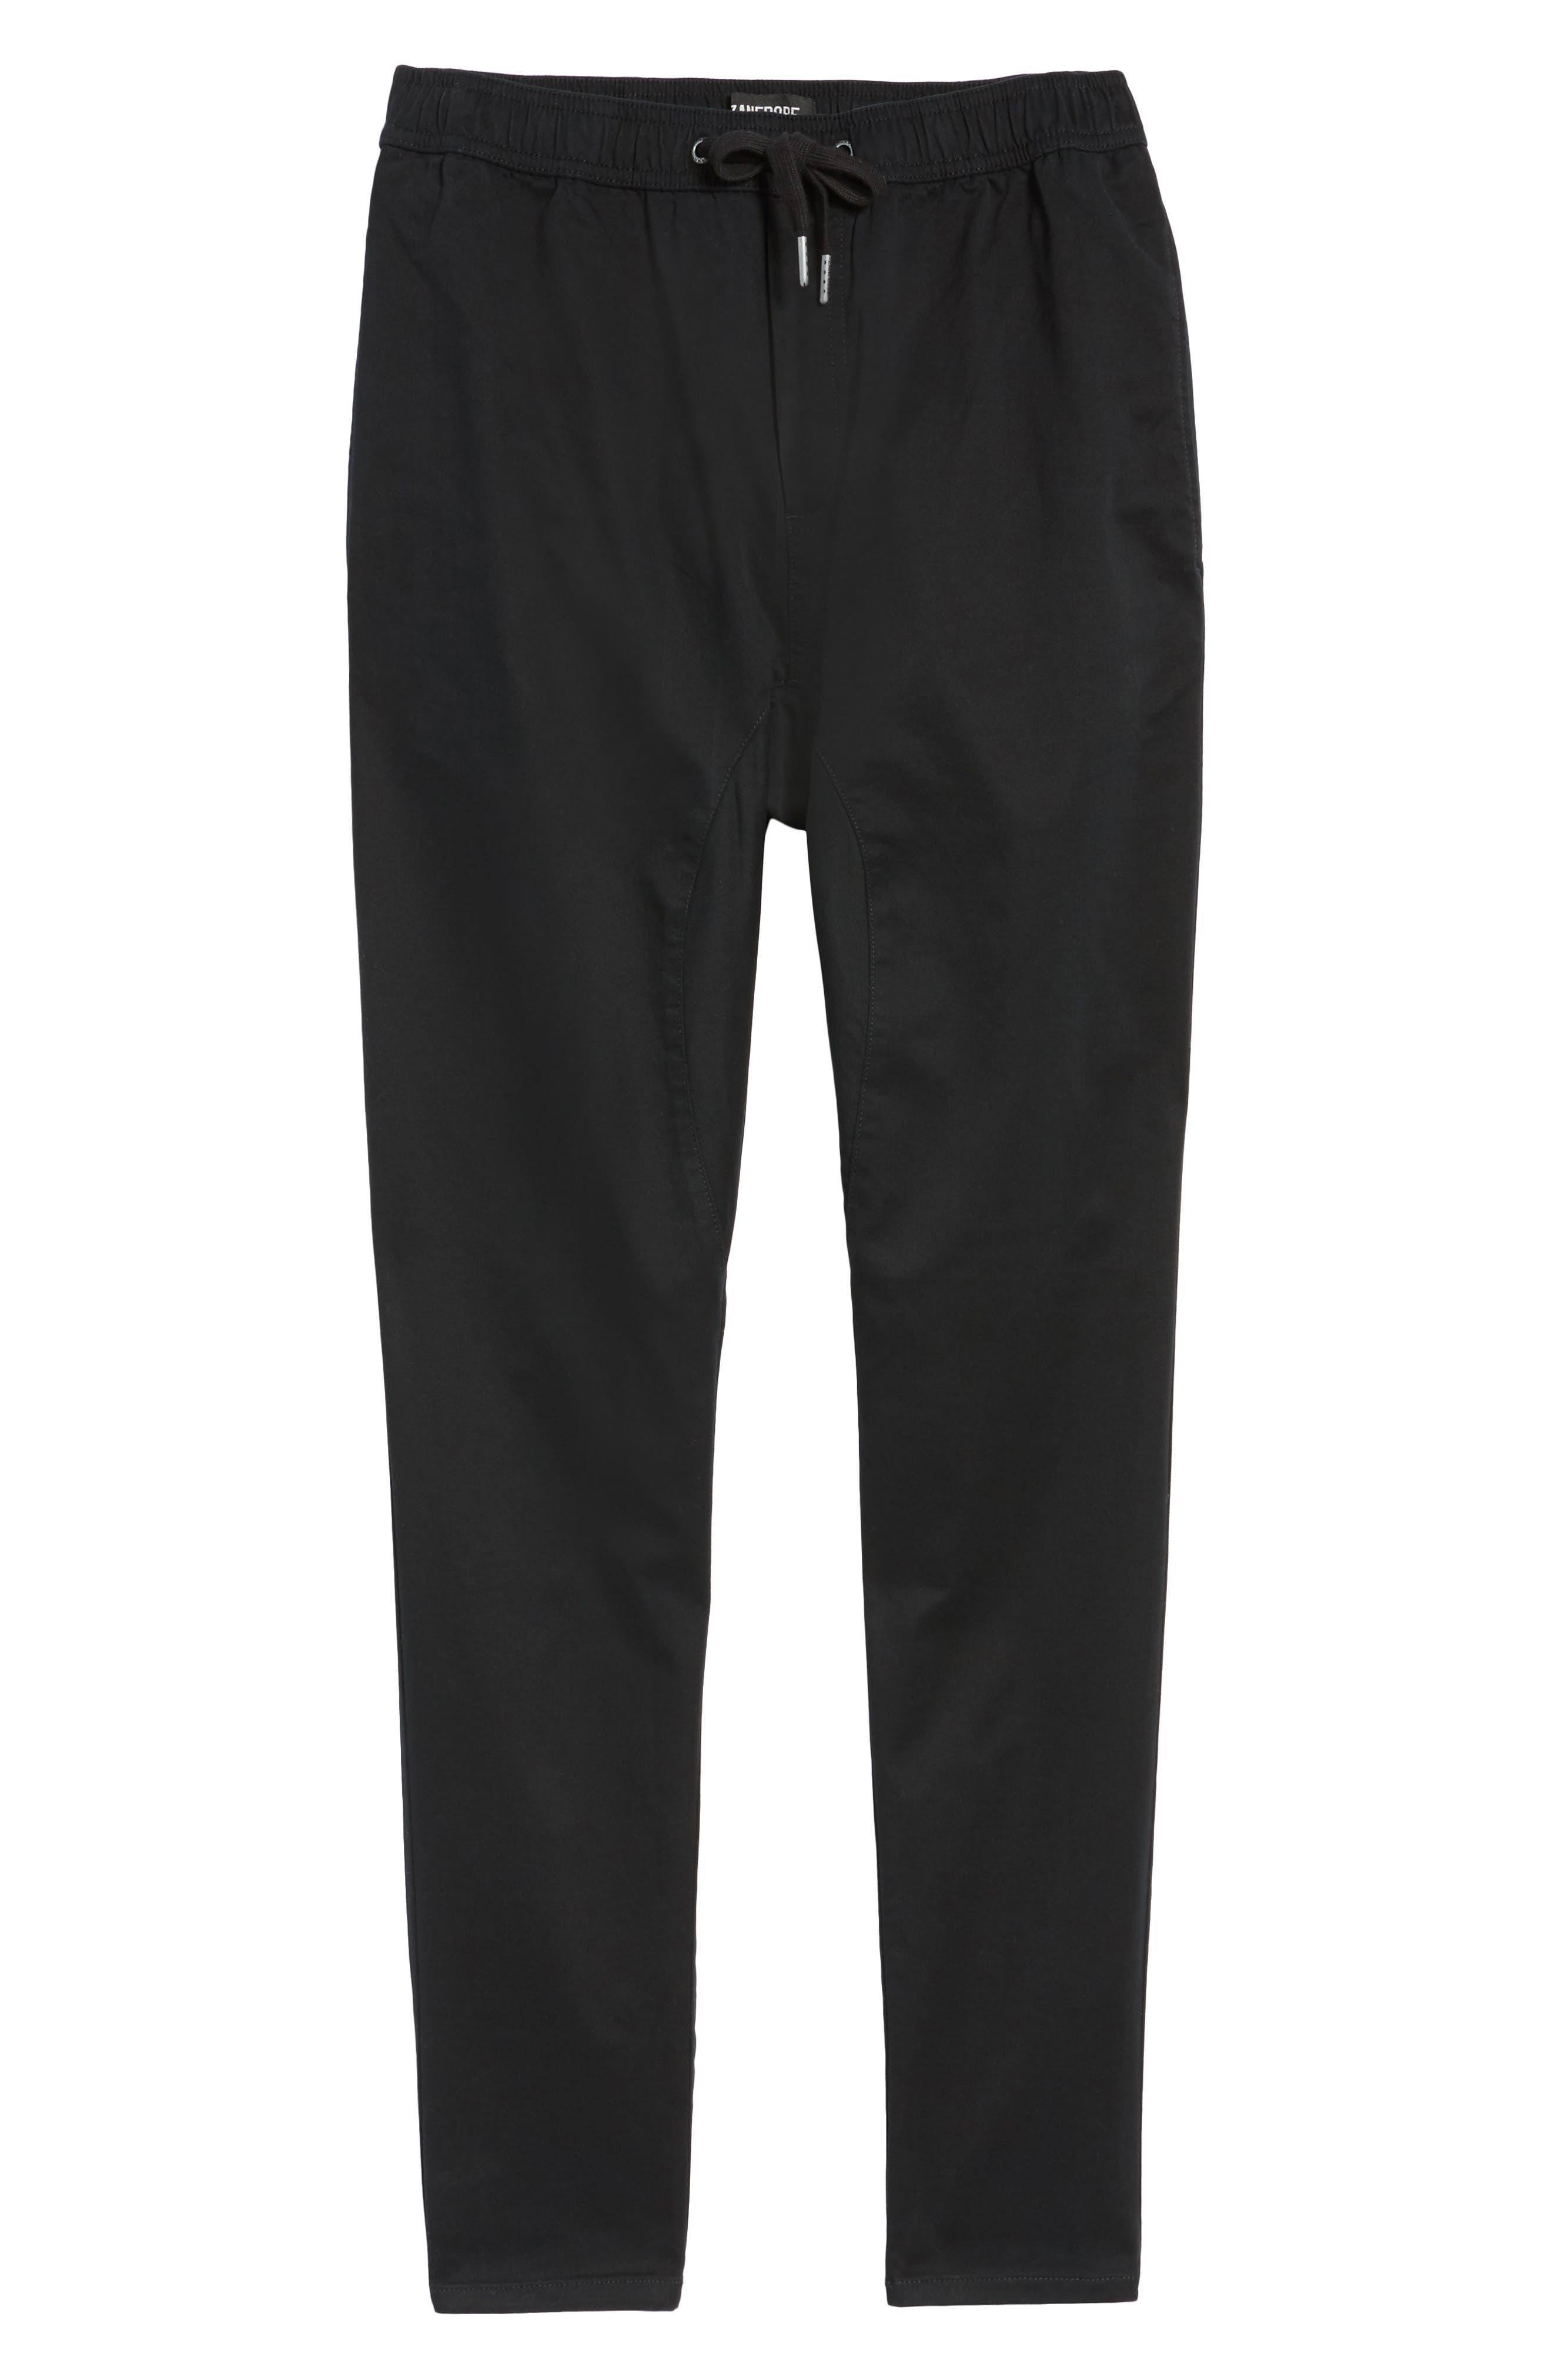 ZANEROBE Salerno Stretch Woven Jogger Pants, Main, color, BLACK